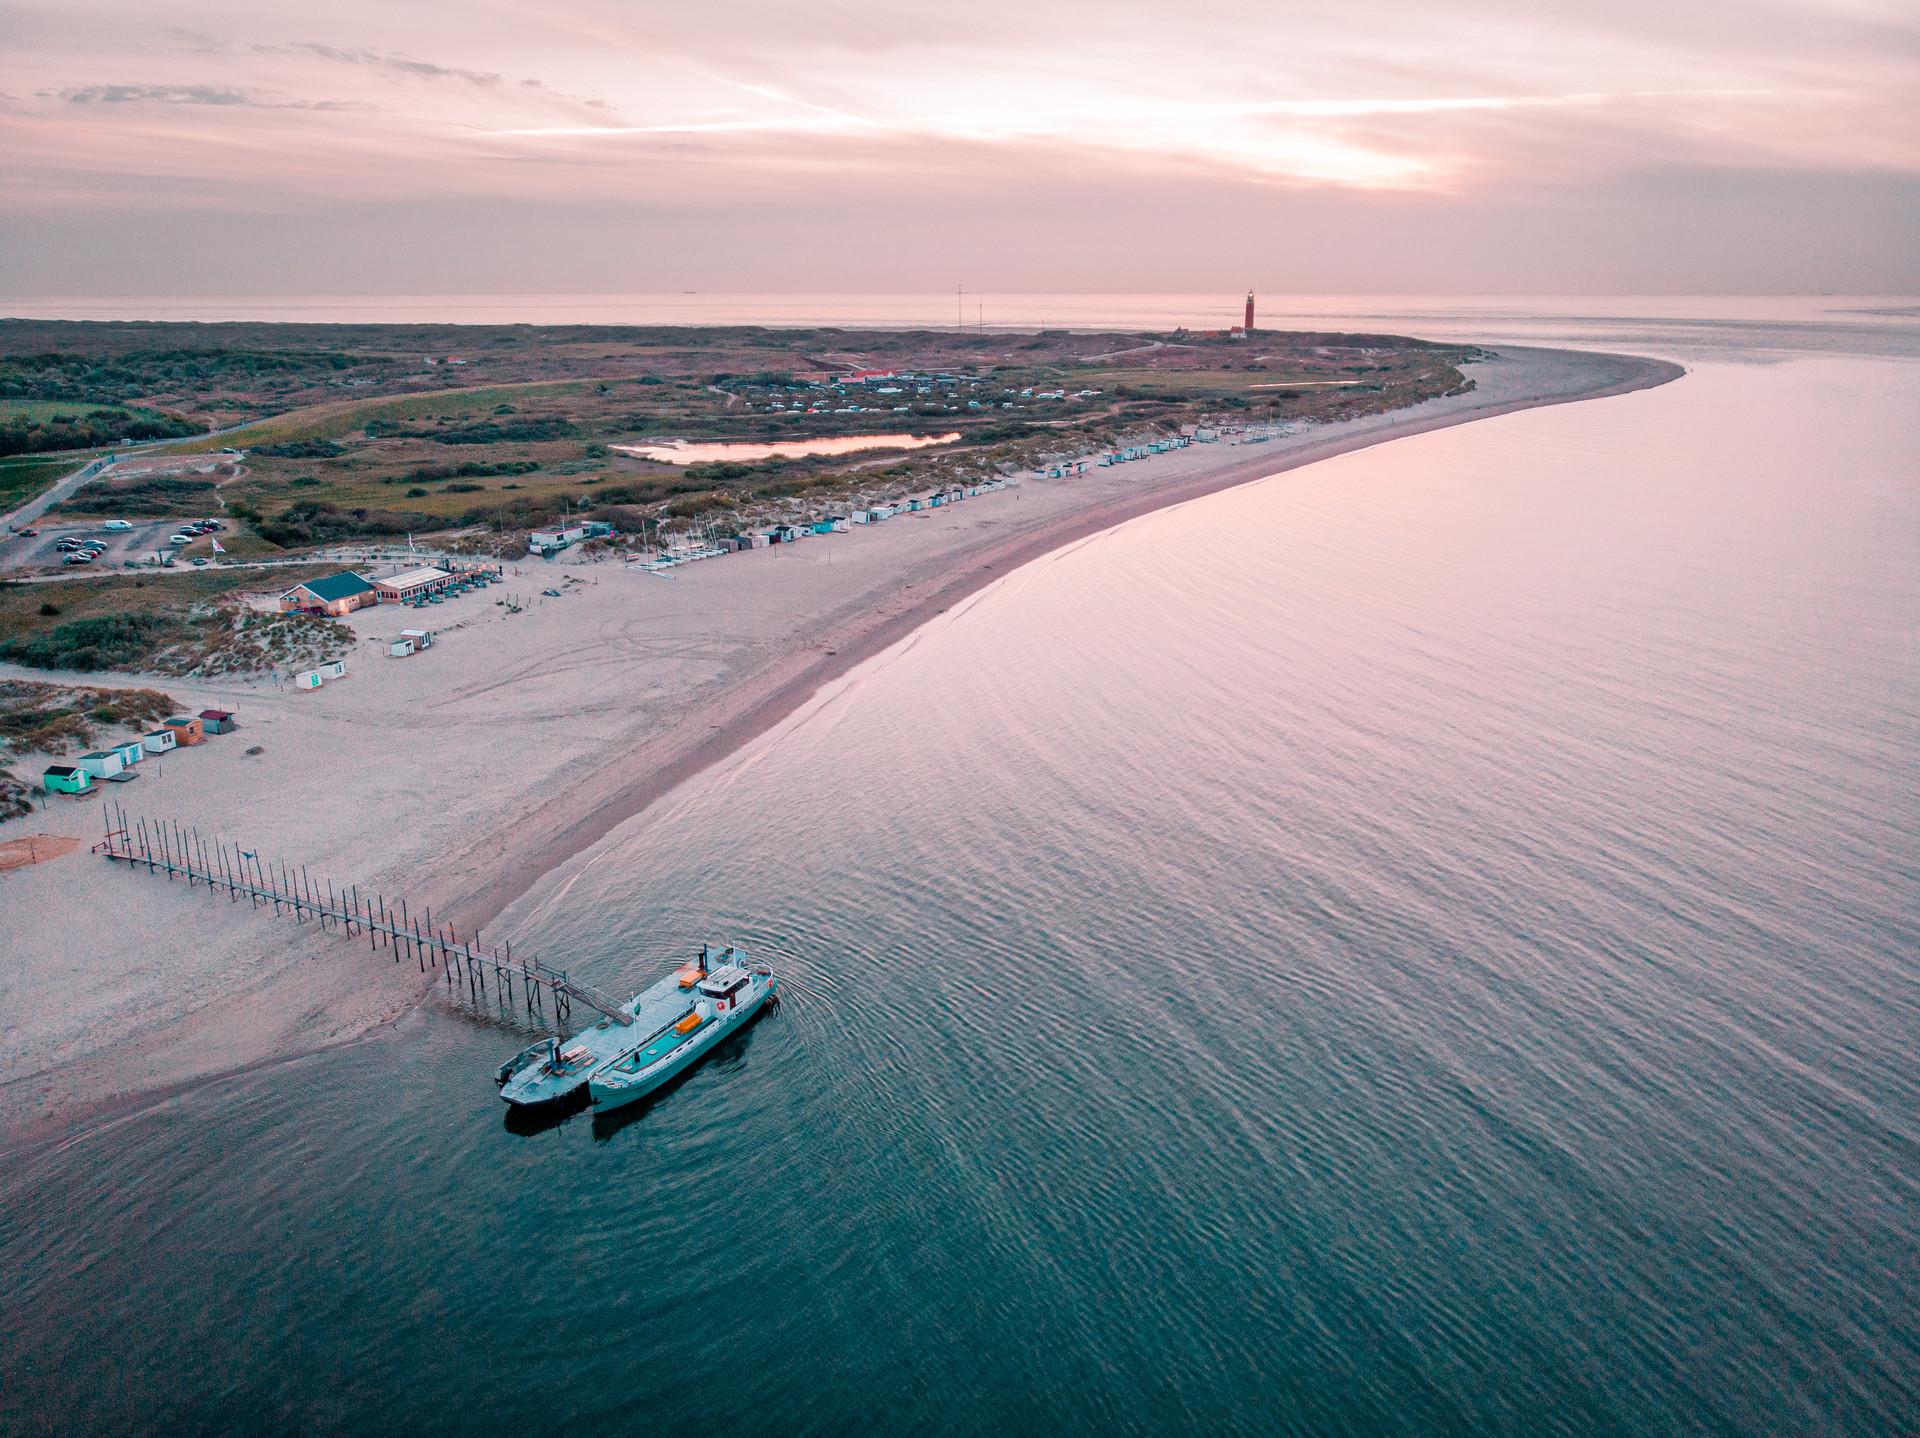 Veer Texel - Vlieland